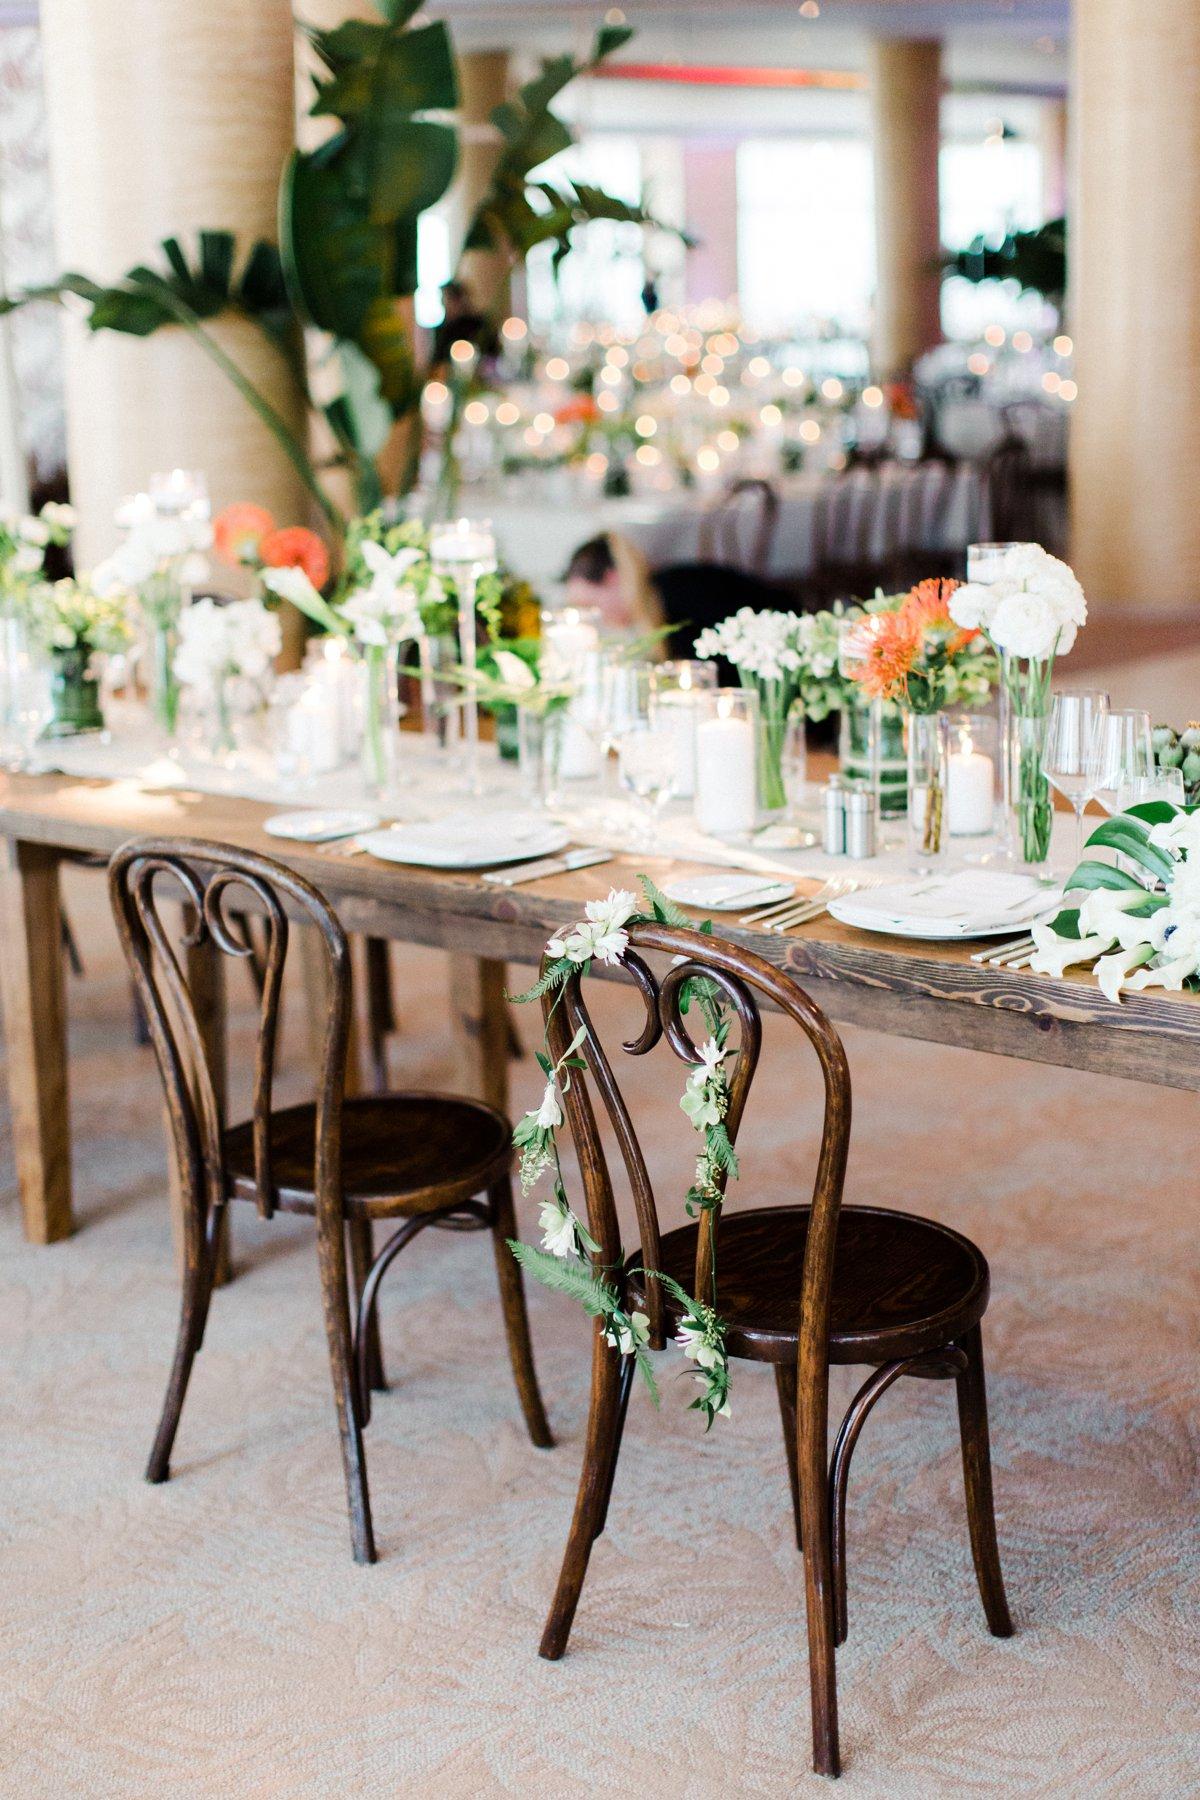 tropical wedding sweetheart tables - photo by Anna Delores http://ruffledblog.com/chic-modern-wedding-at-four-seasons-santa-barbara